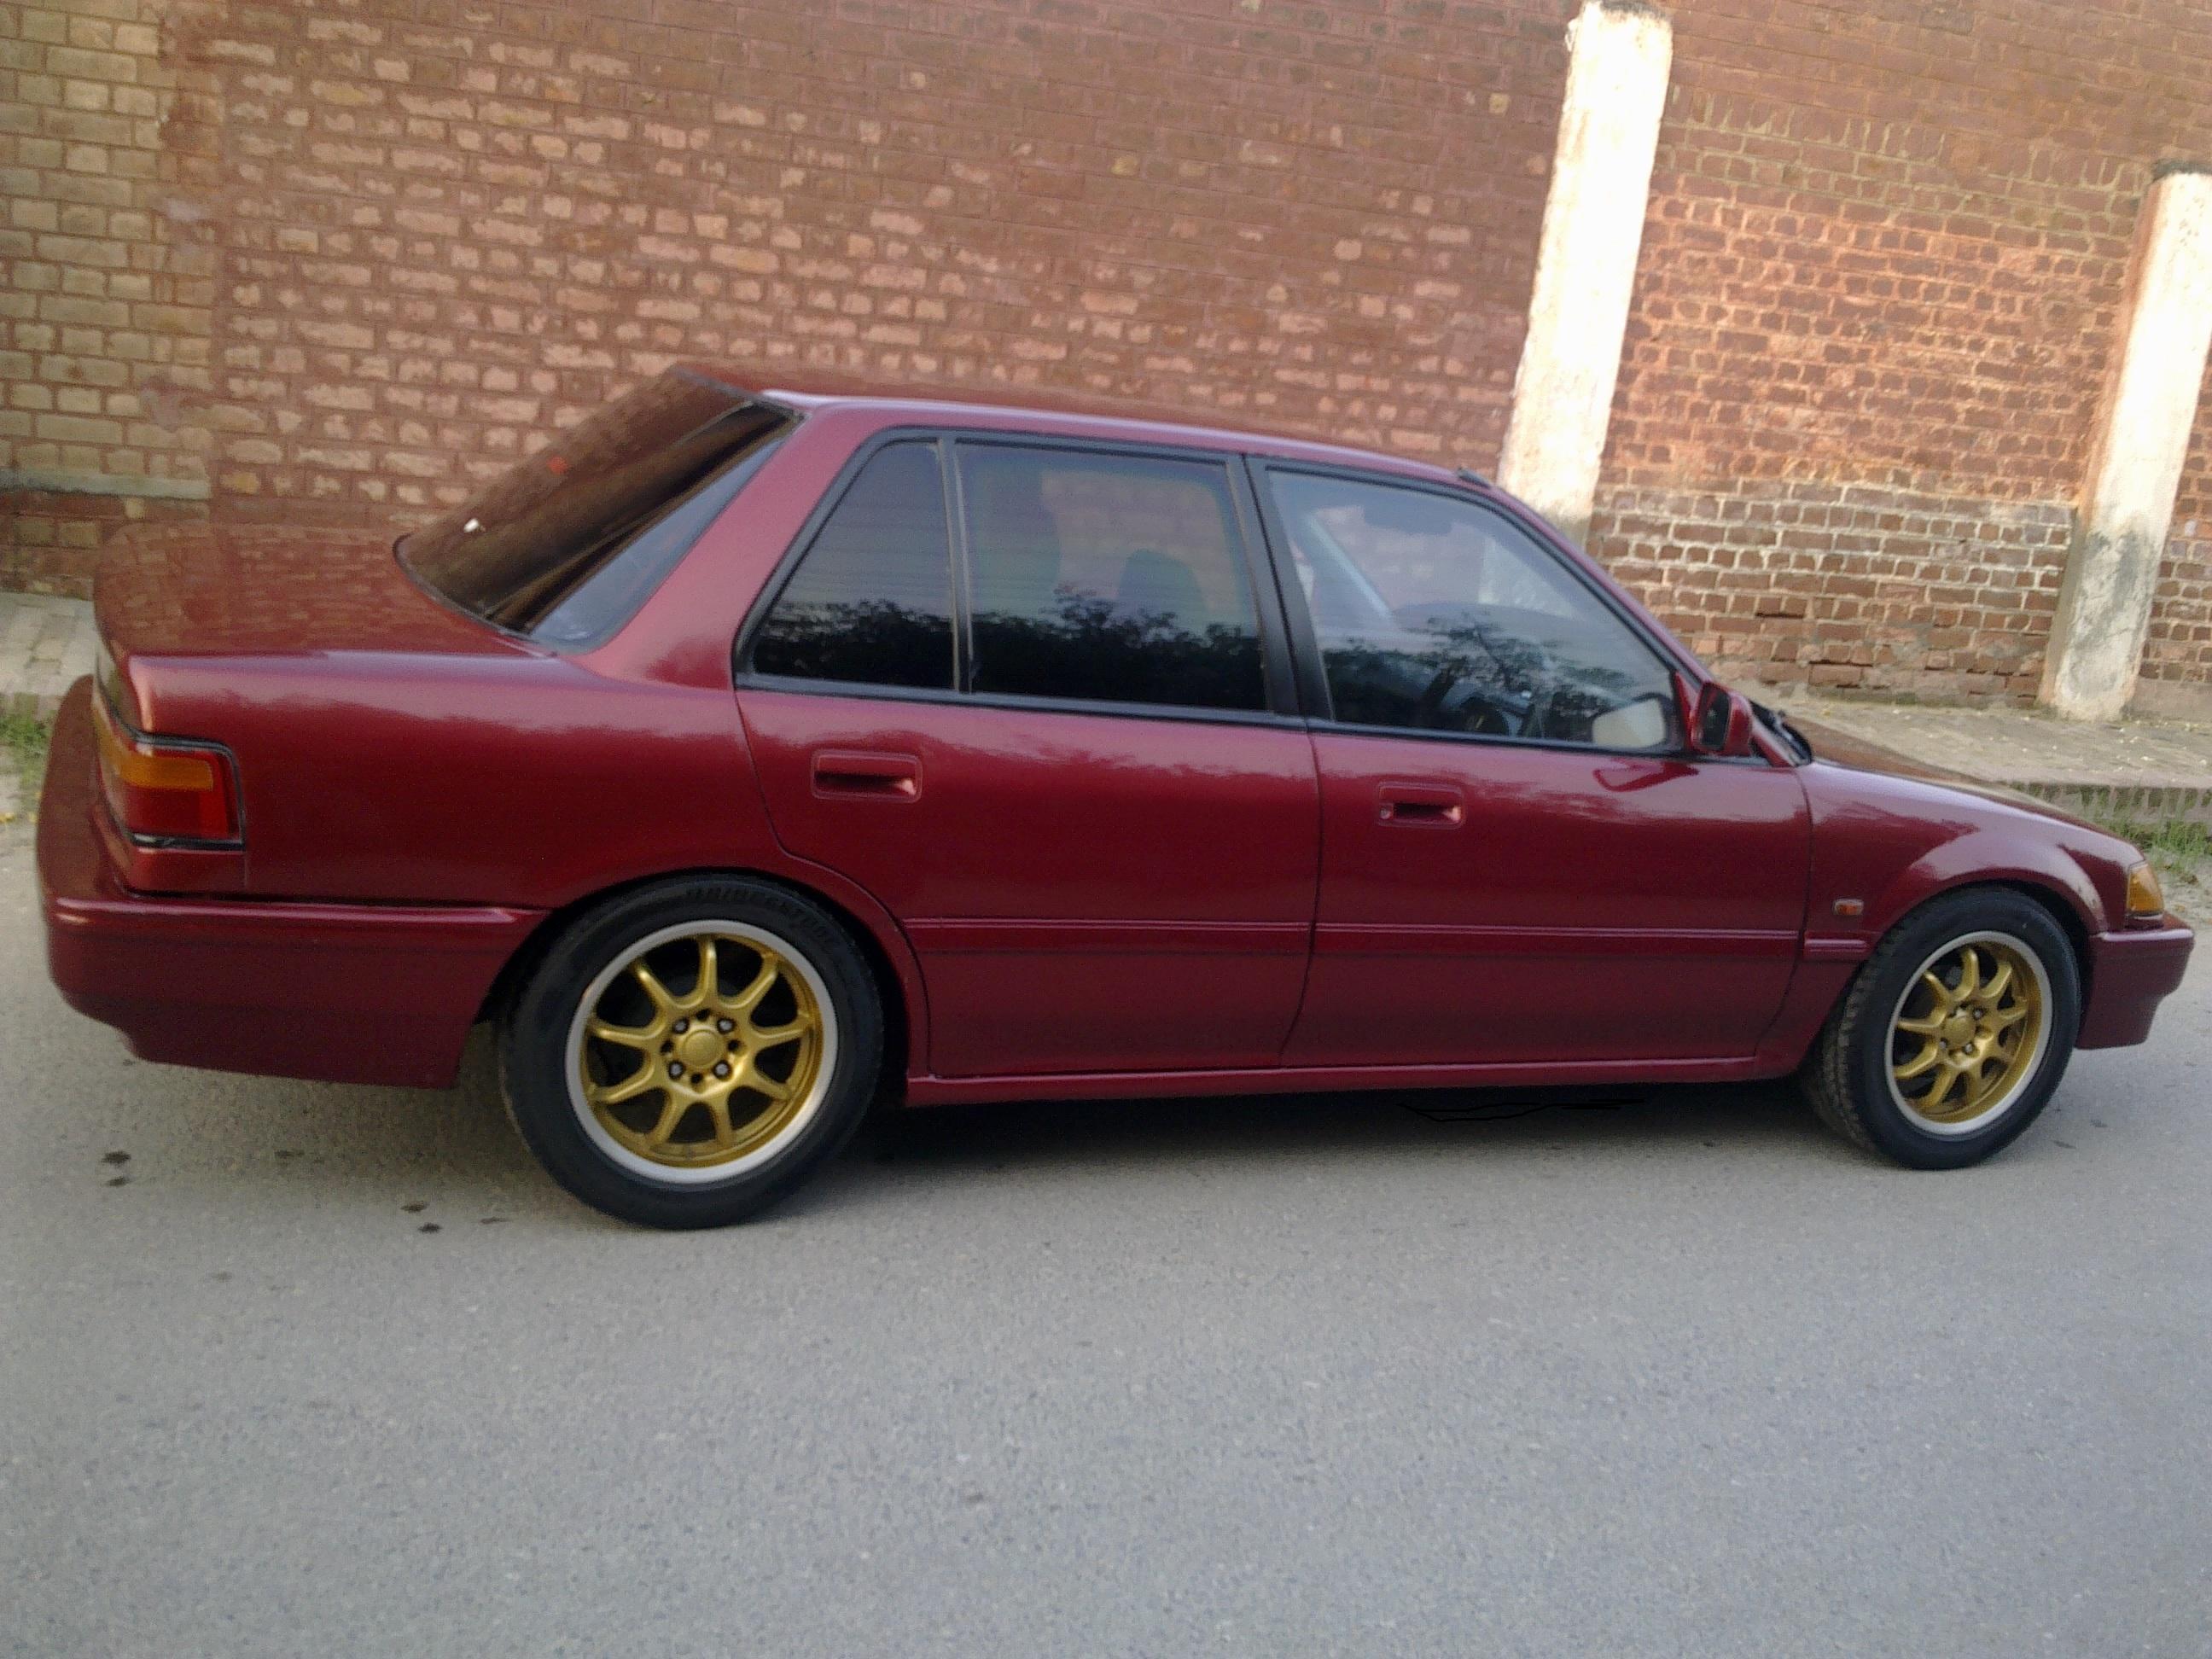 Honda Civic 1988 of qas9866 - Member Ride 16768 | PakWheels